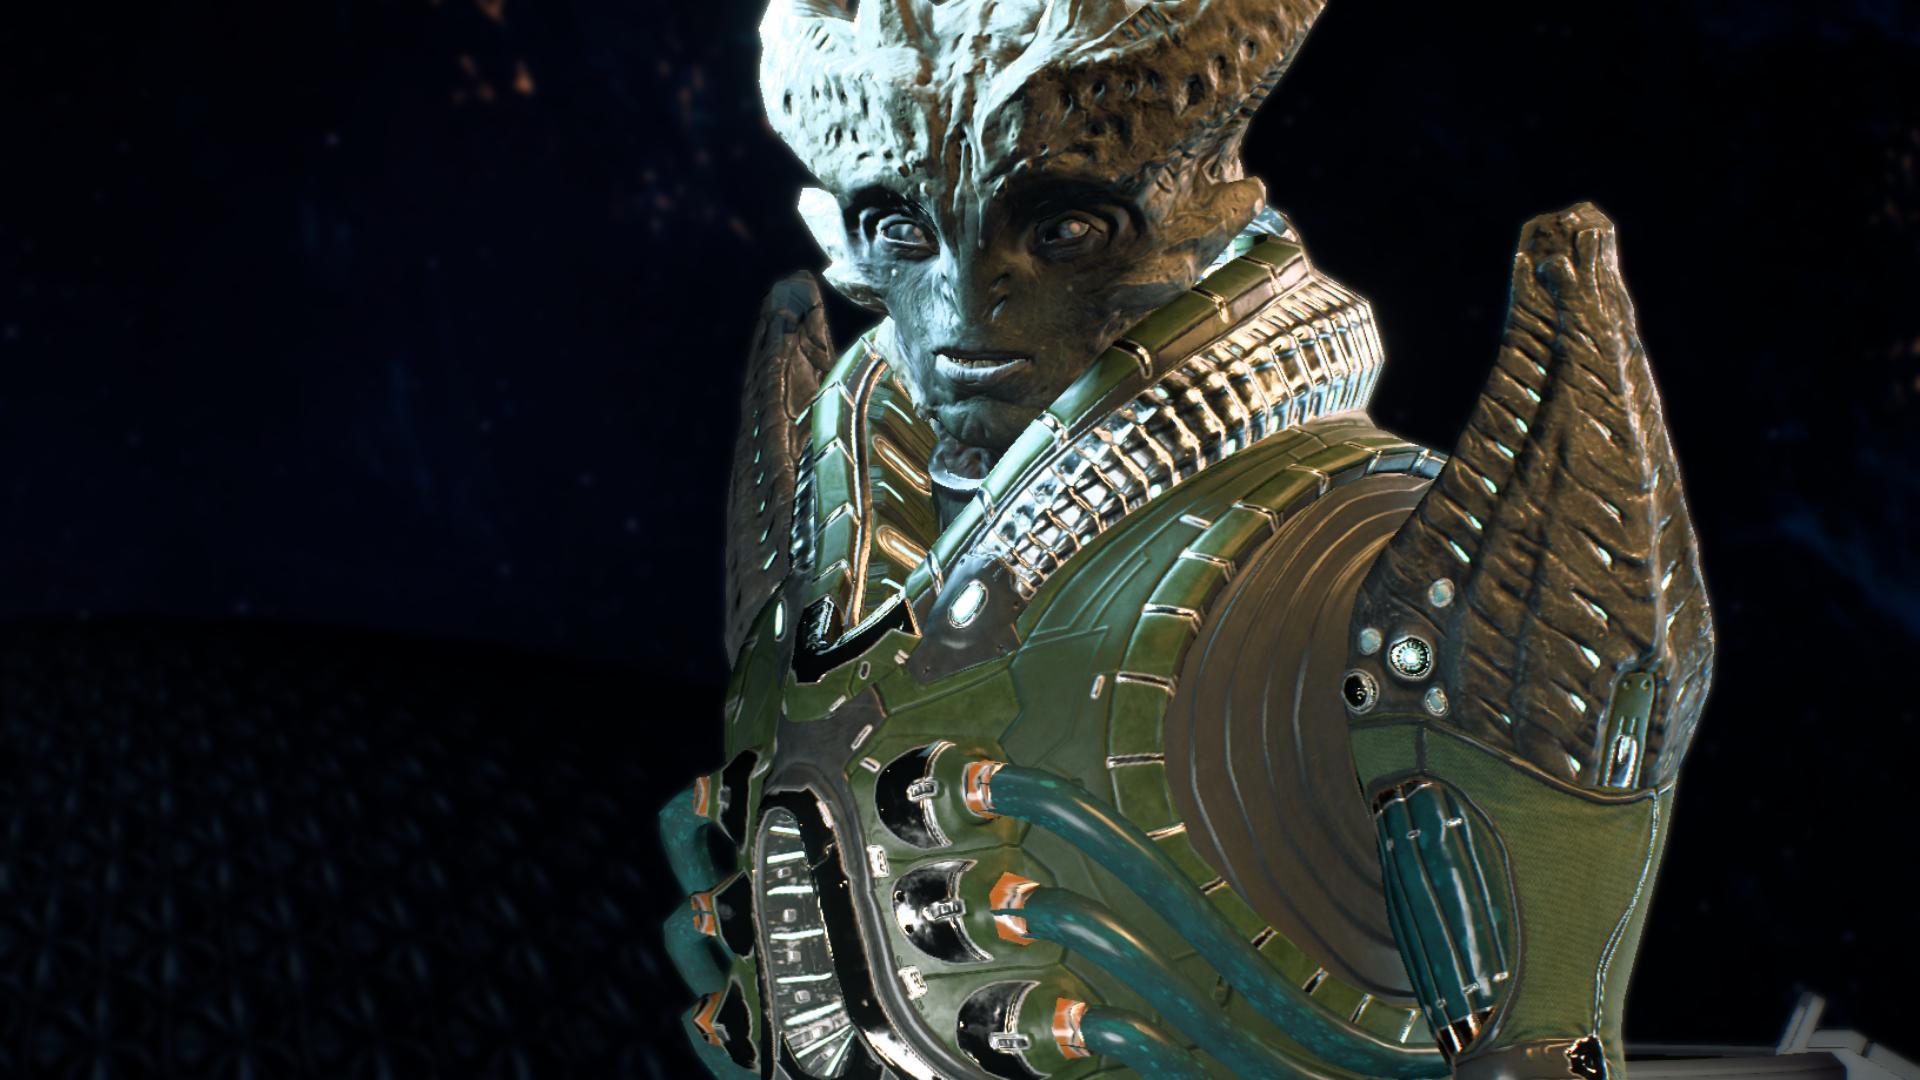 MassEffectAndromeda 2017-04-21 22-33-58-93.jpg - Mass Effect: Andromeda